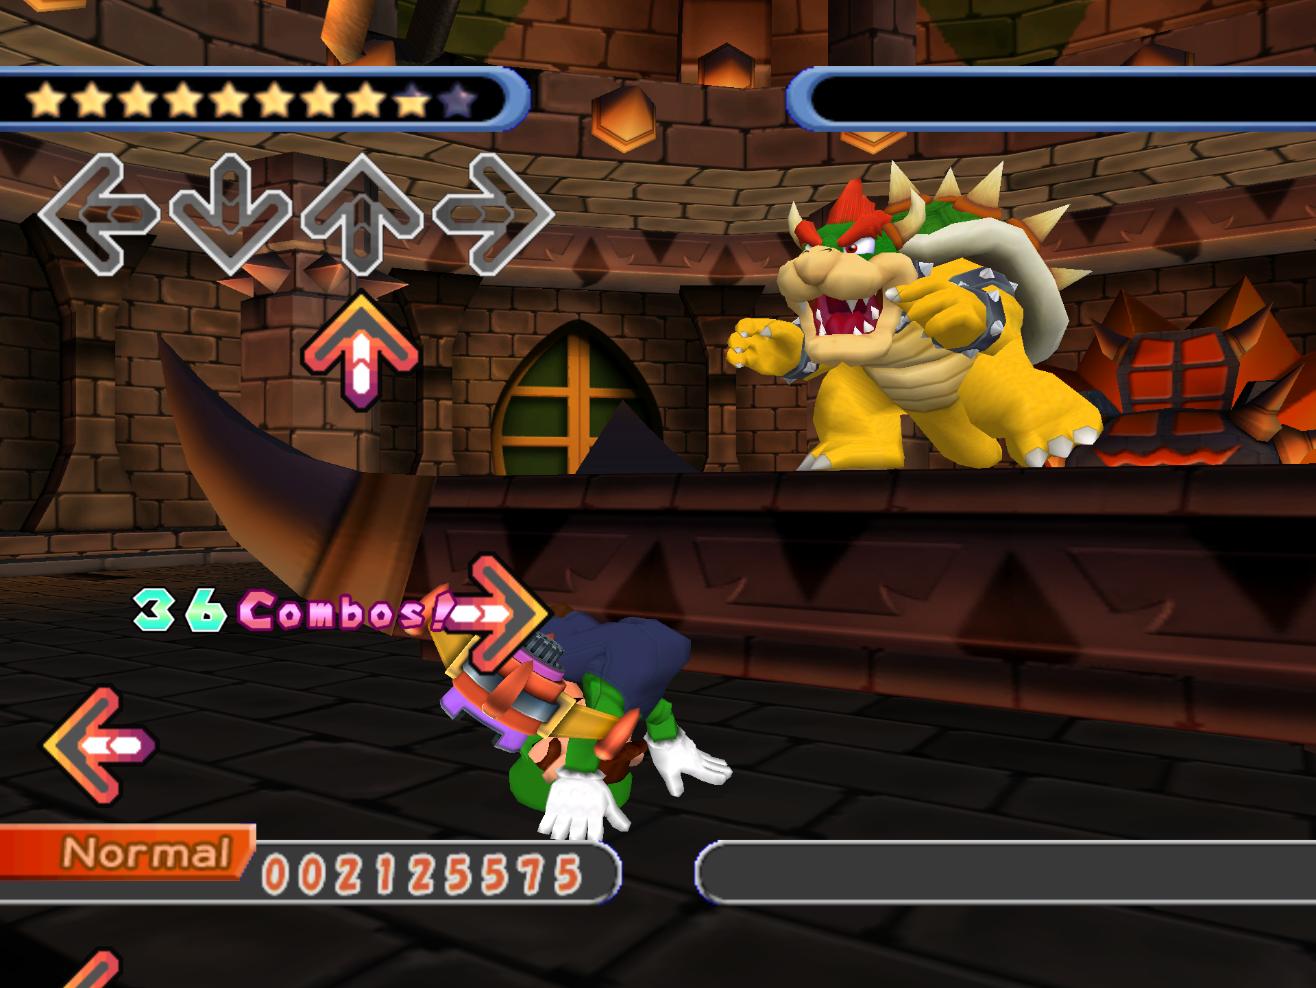 Alpha Coders Wallpaper Abyss Video Game Dance Dance Revolution Mario 1316x988